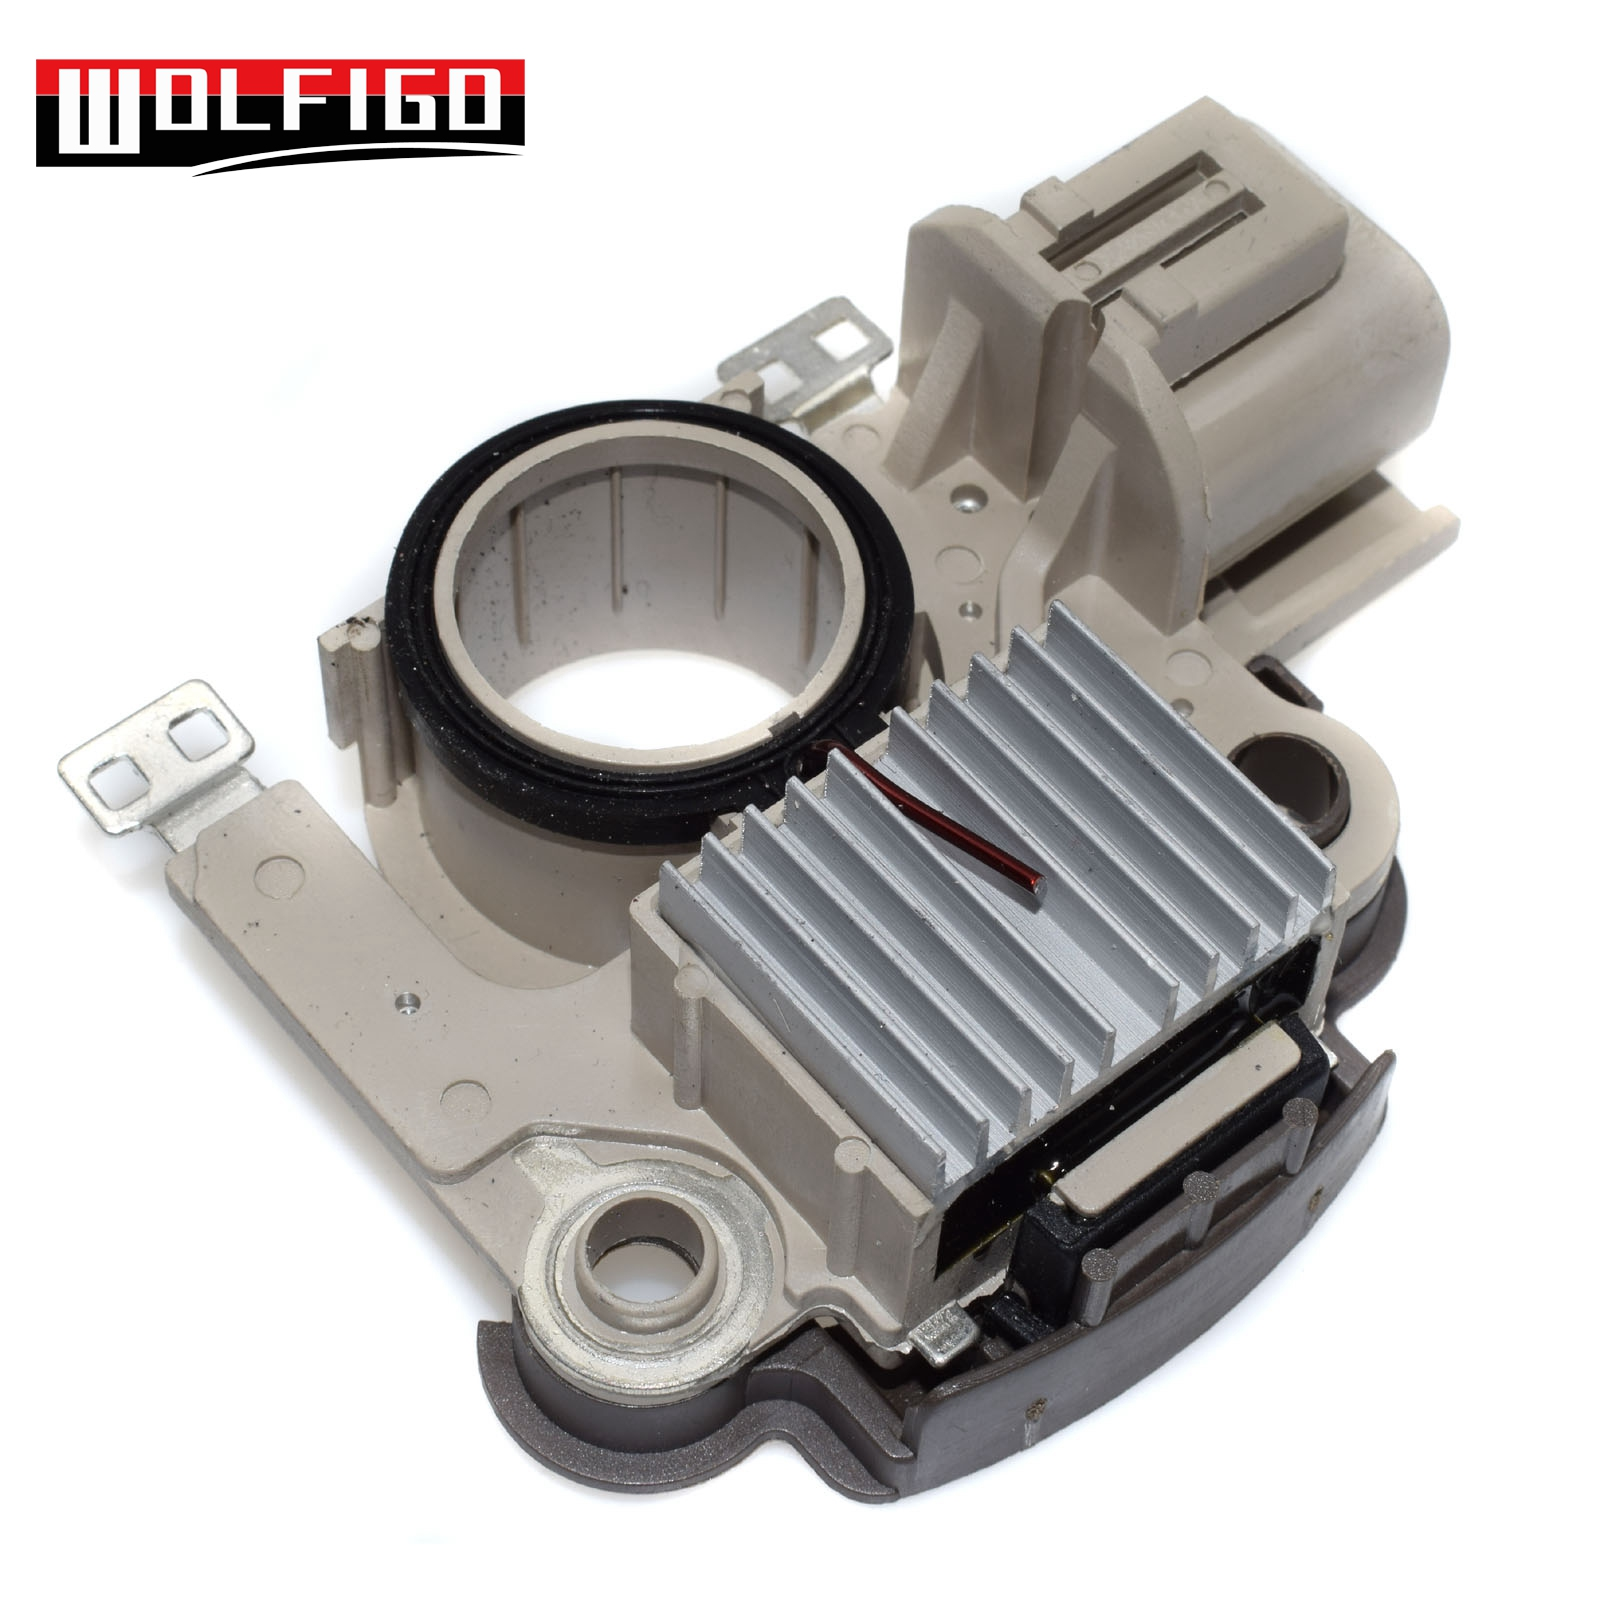 WOLFIGO Neue Lichtmaschine Spannung Regler Fit Für MAZDA 323 626 Miata MX-6 RX-7 Protege B61P-18-300, A2T17574, A2T19991, a866X20472